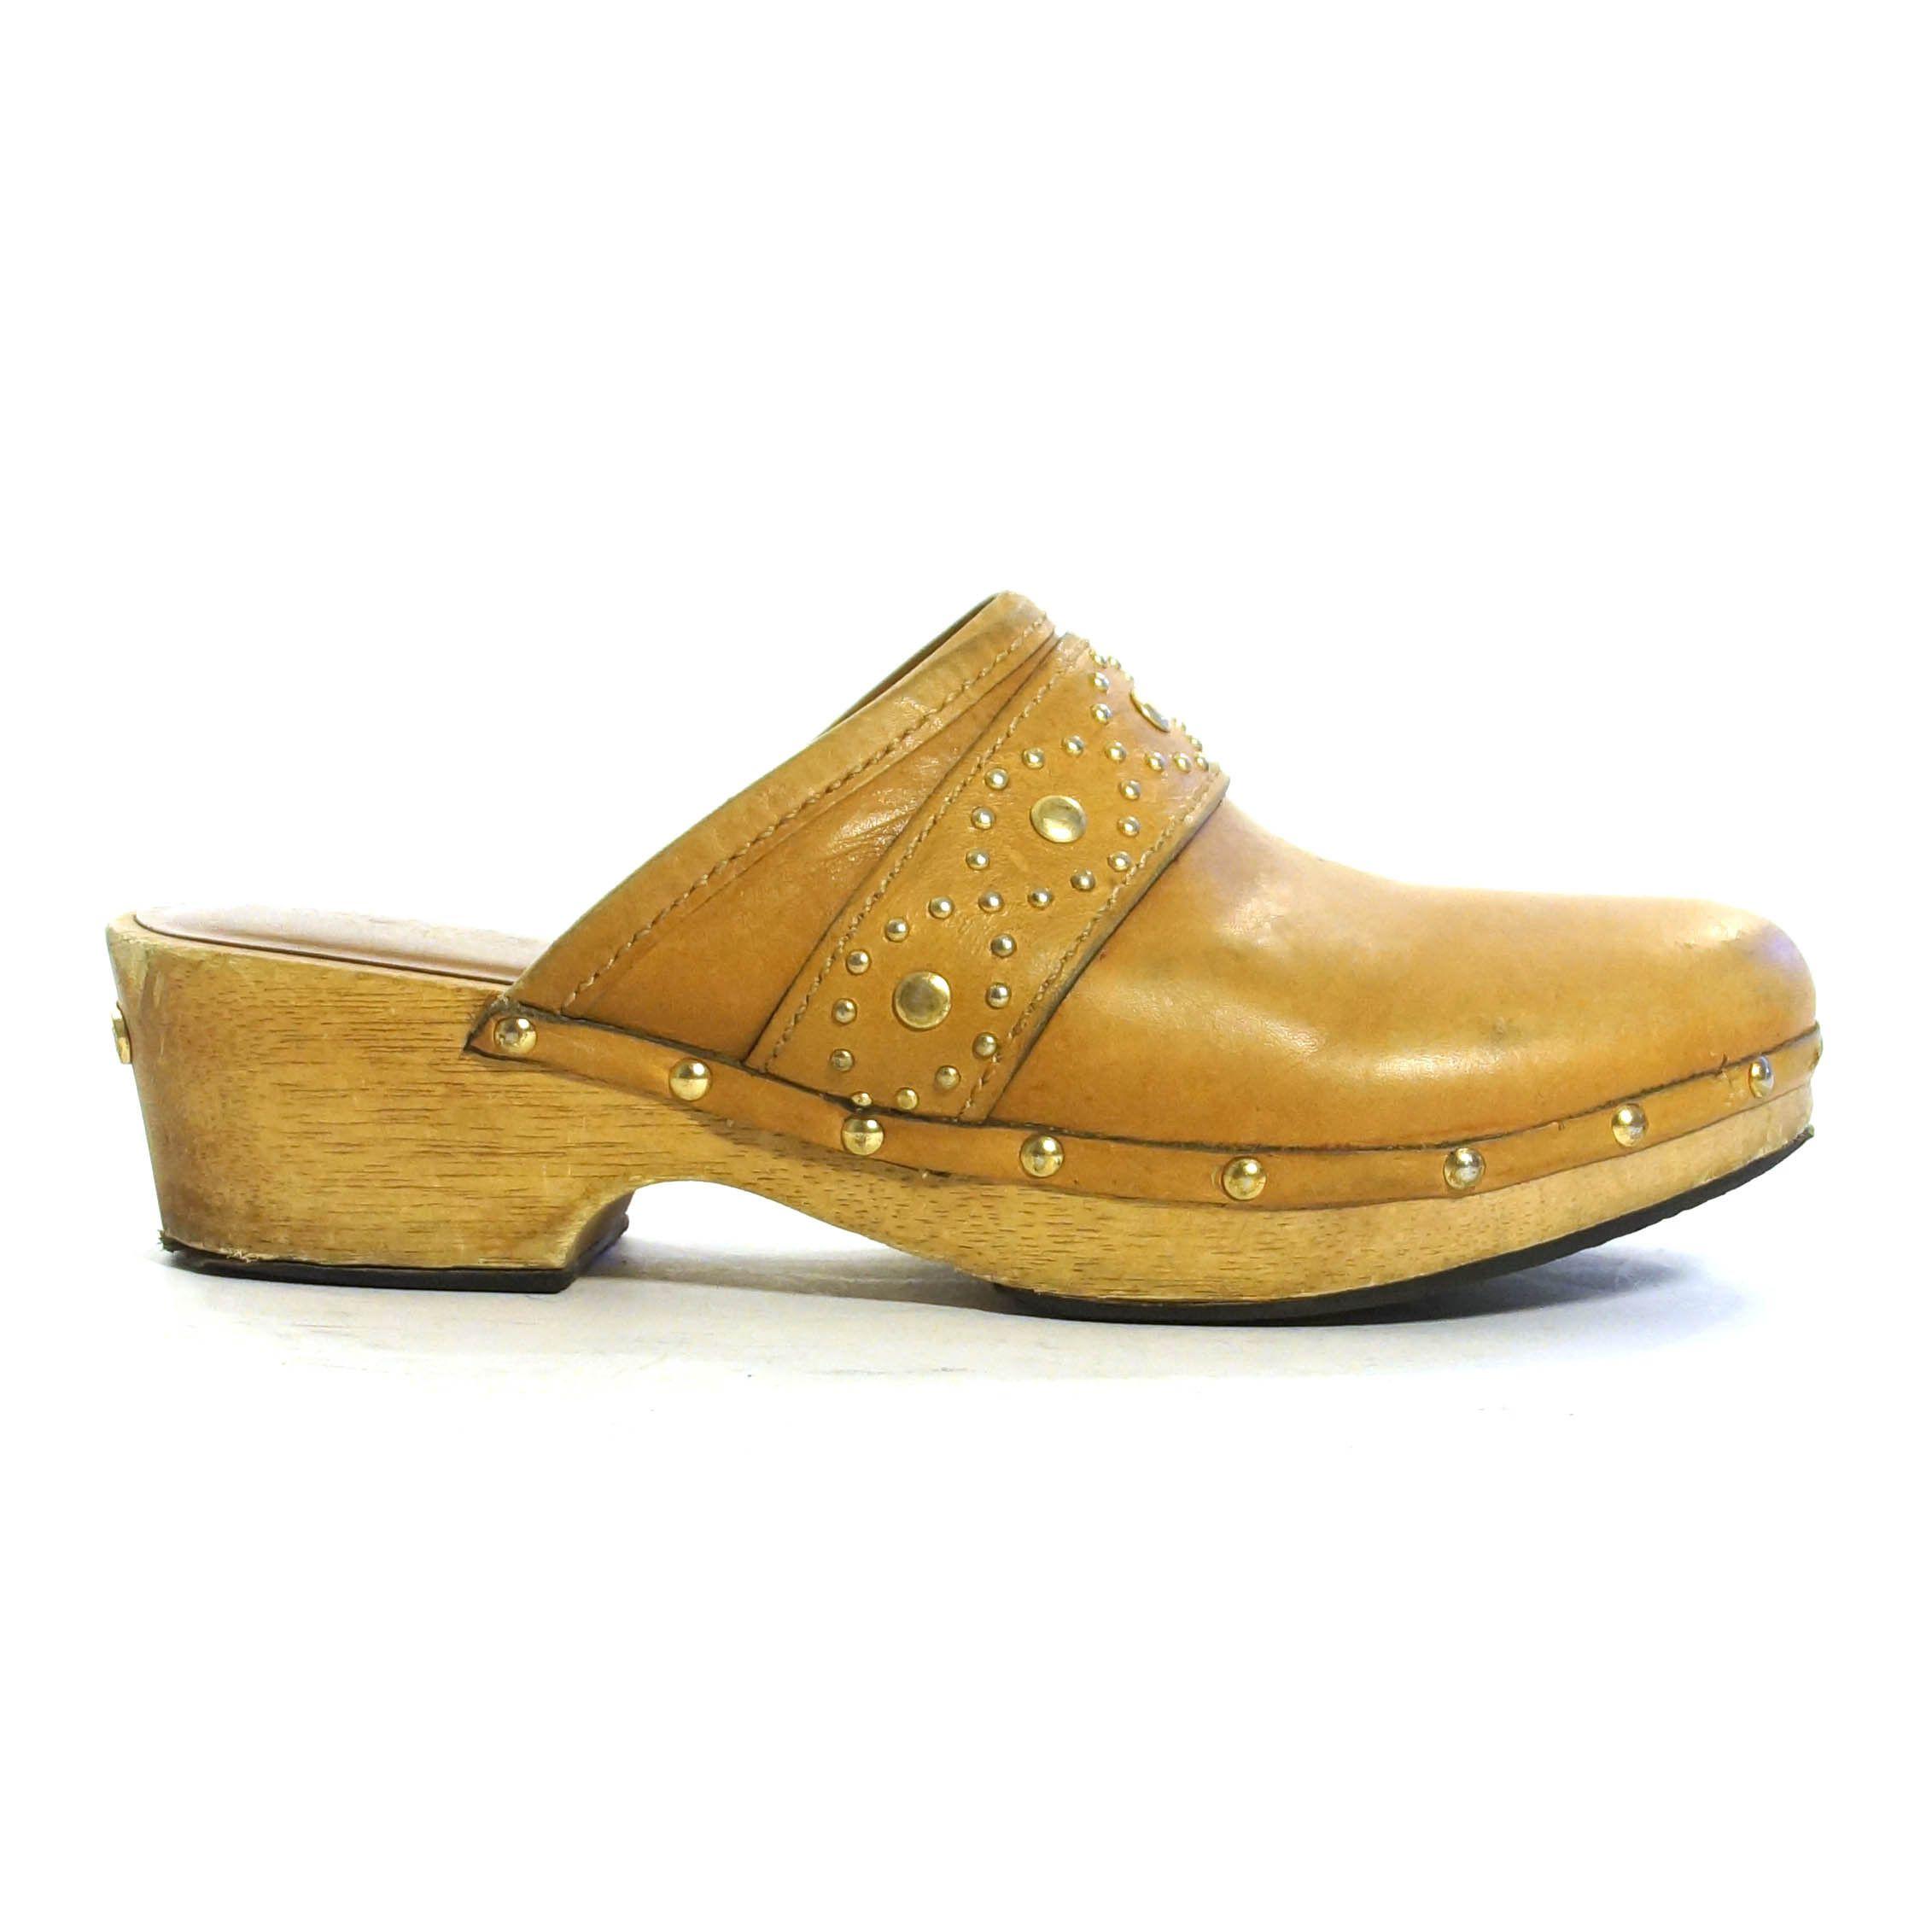 0990f13918dd3 Michael Kors Wooden Clogs Vintage 90s Slip On Brown Leather Block ...